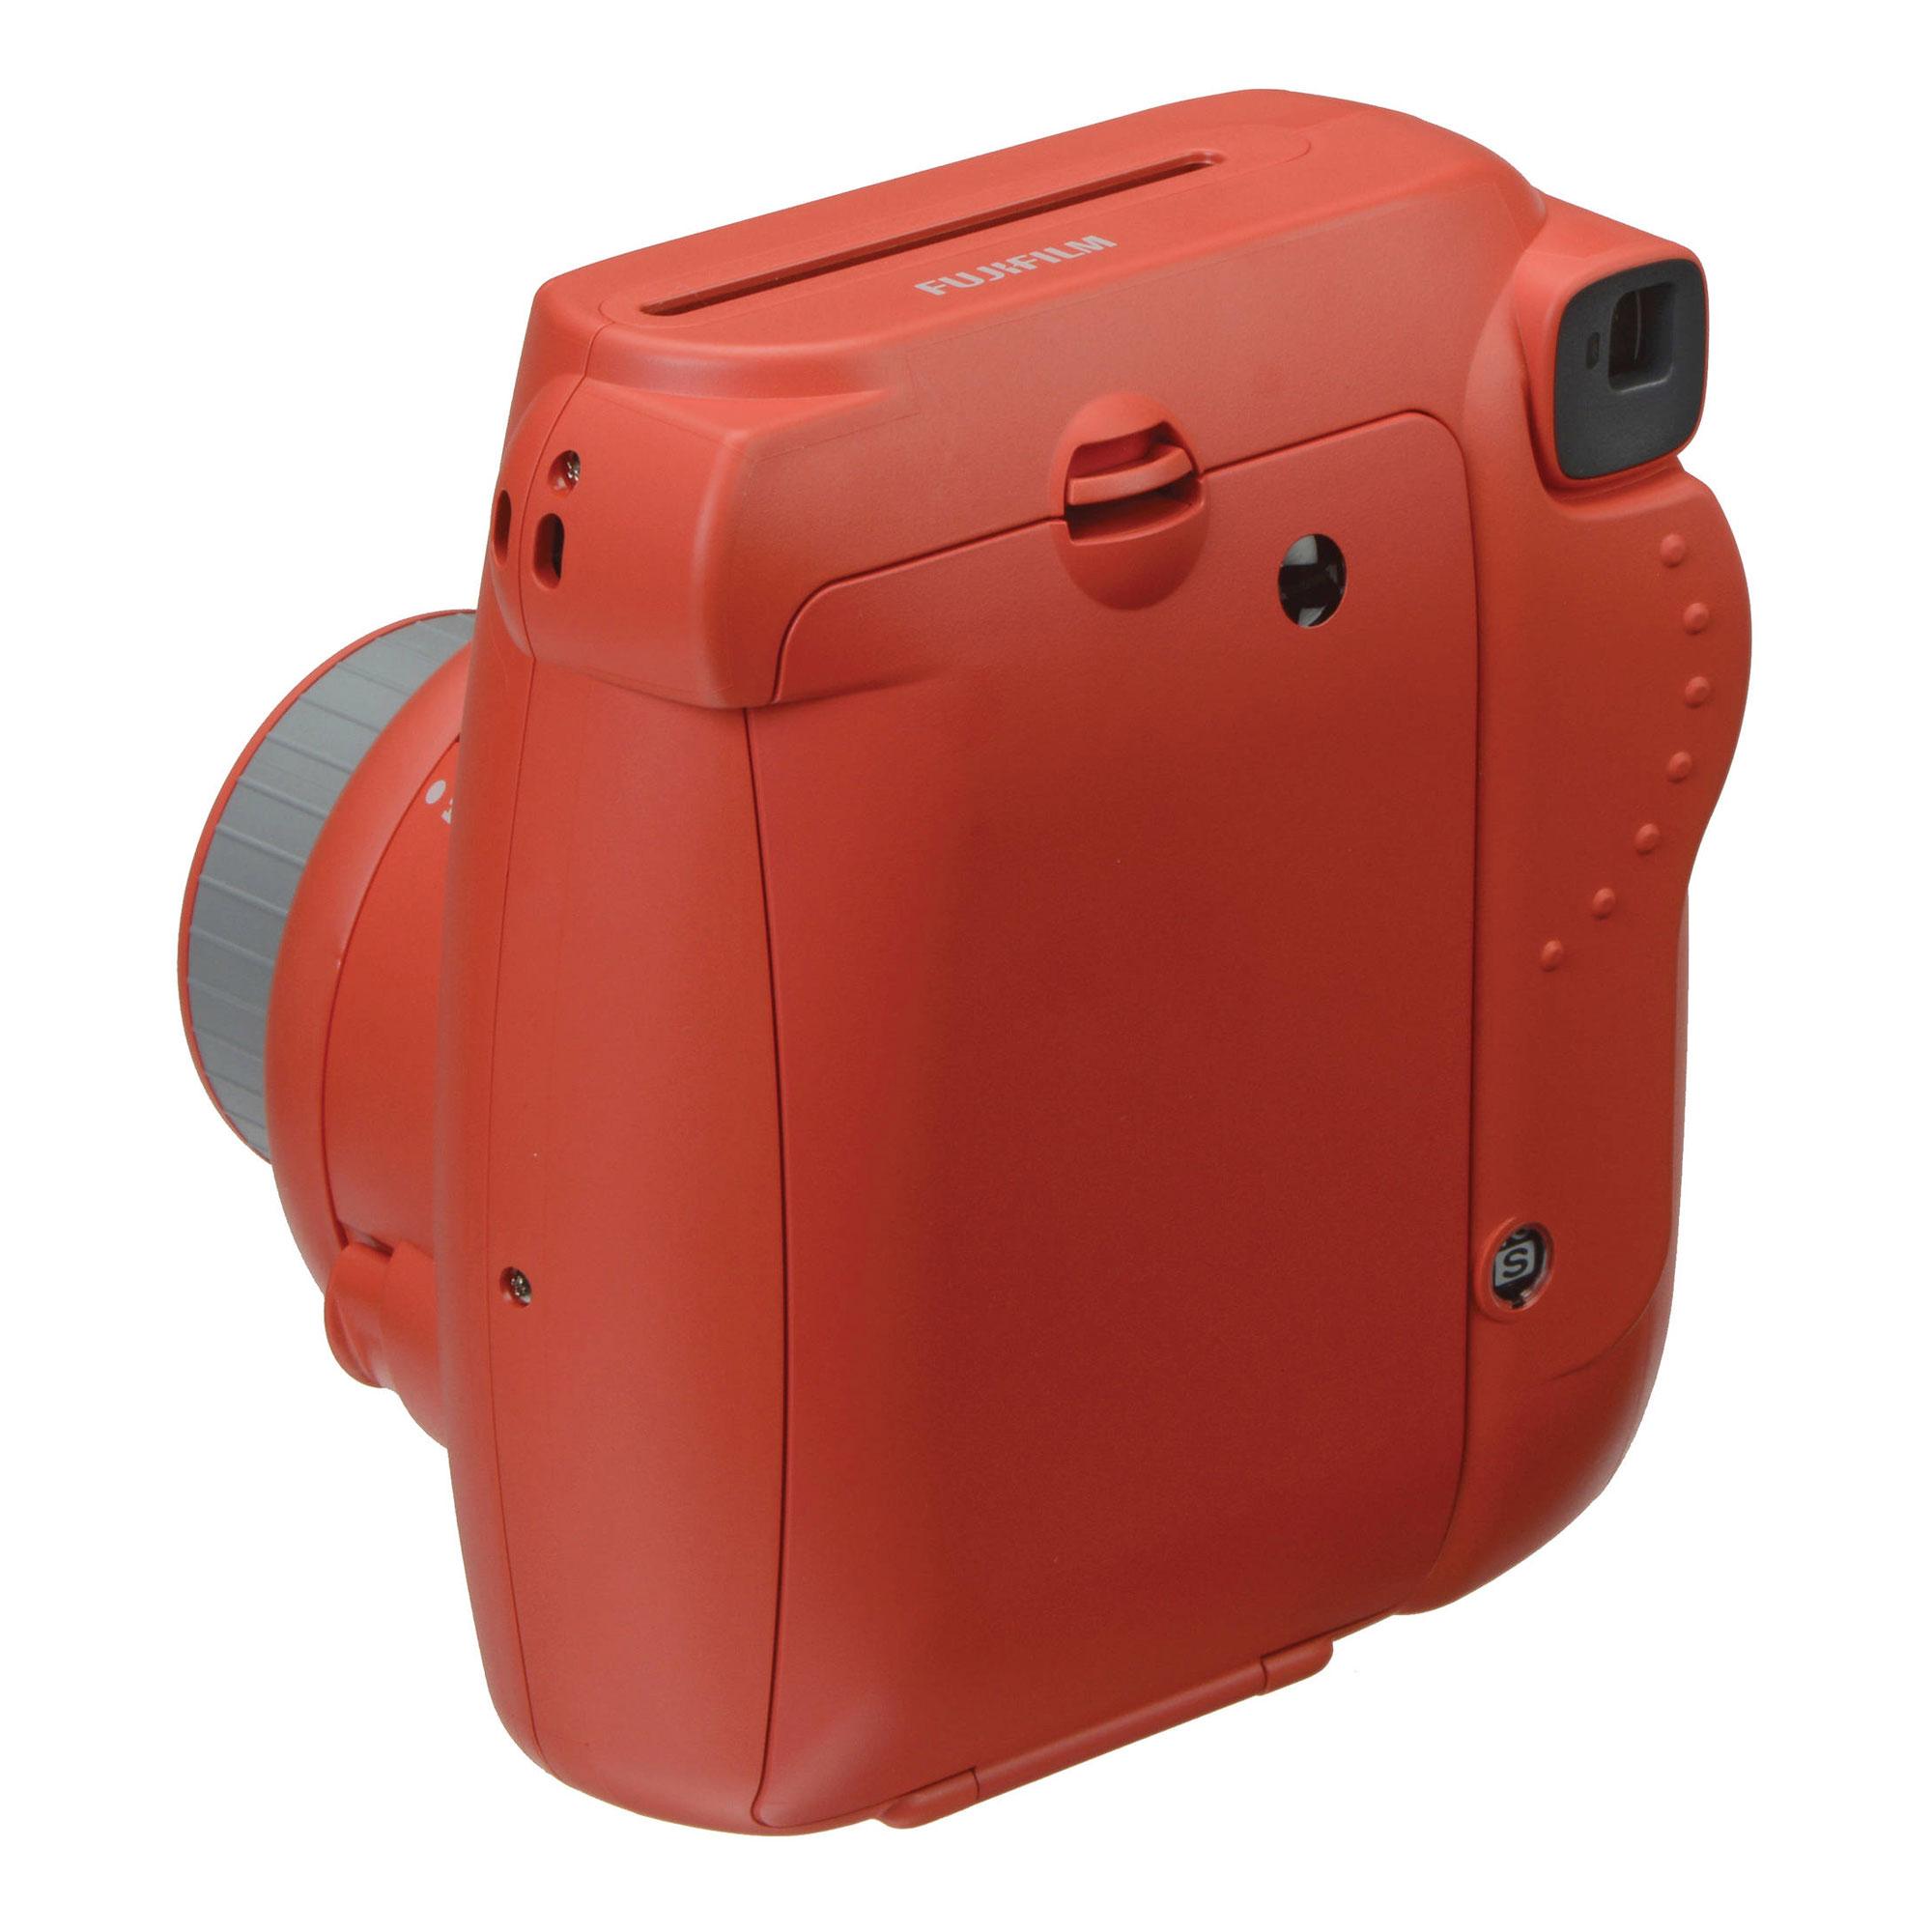 Instax Mini 8 Instant Film Camera Raspberry